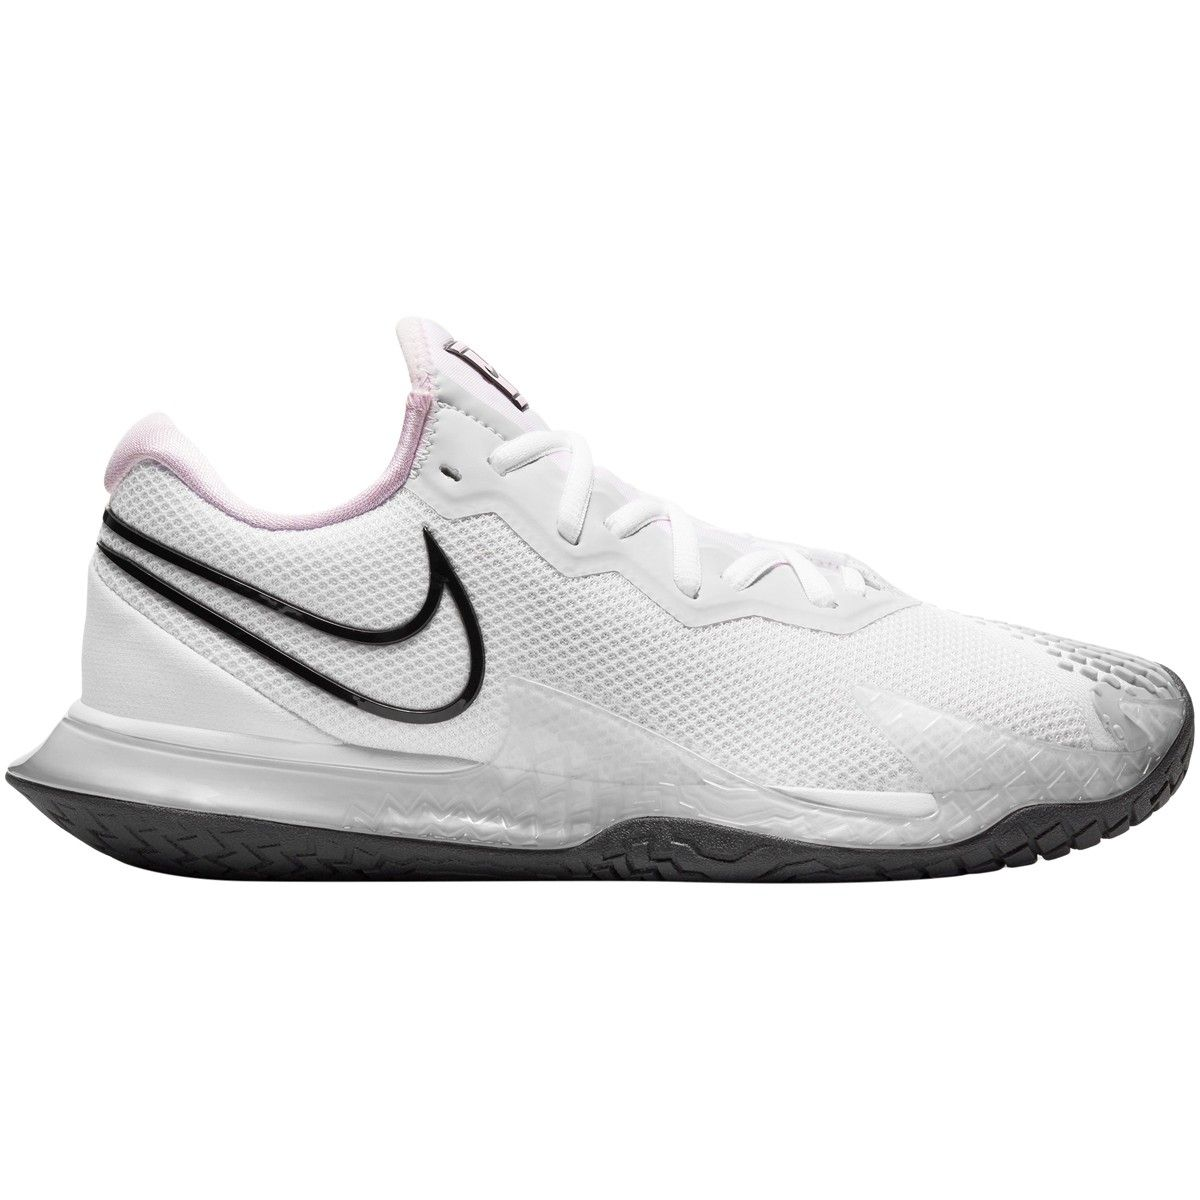 Nike Air Zoom Vapor Cage 4 HC Women's Tennis Shoes